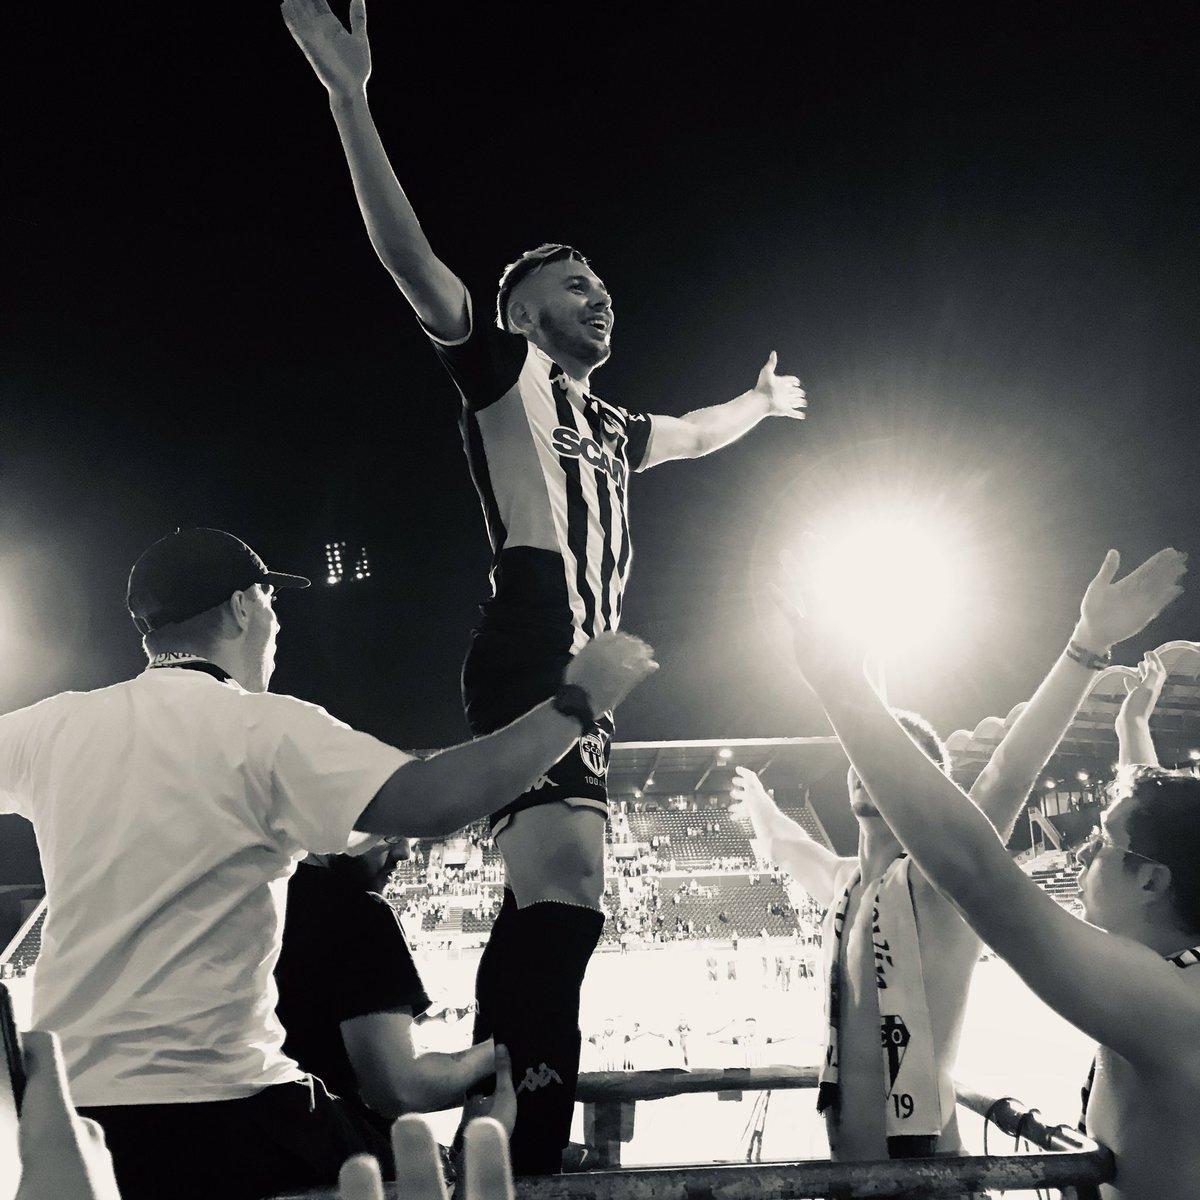 Angers SCO 3 - 0 FC Metz | Clapping Farid El Melali  #SCOFCM #Angers #AngersSCO #SCO #dalleangevine #ladalleangevine<br>http://pic.twitter.com/0ErSvrtBIs